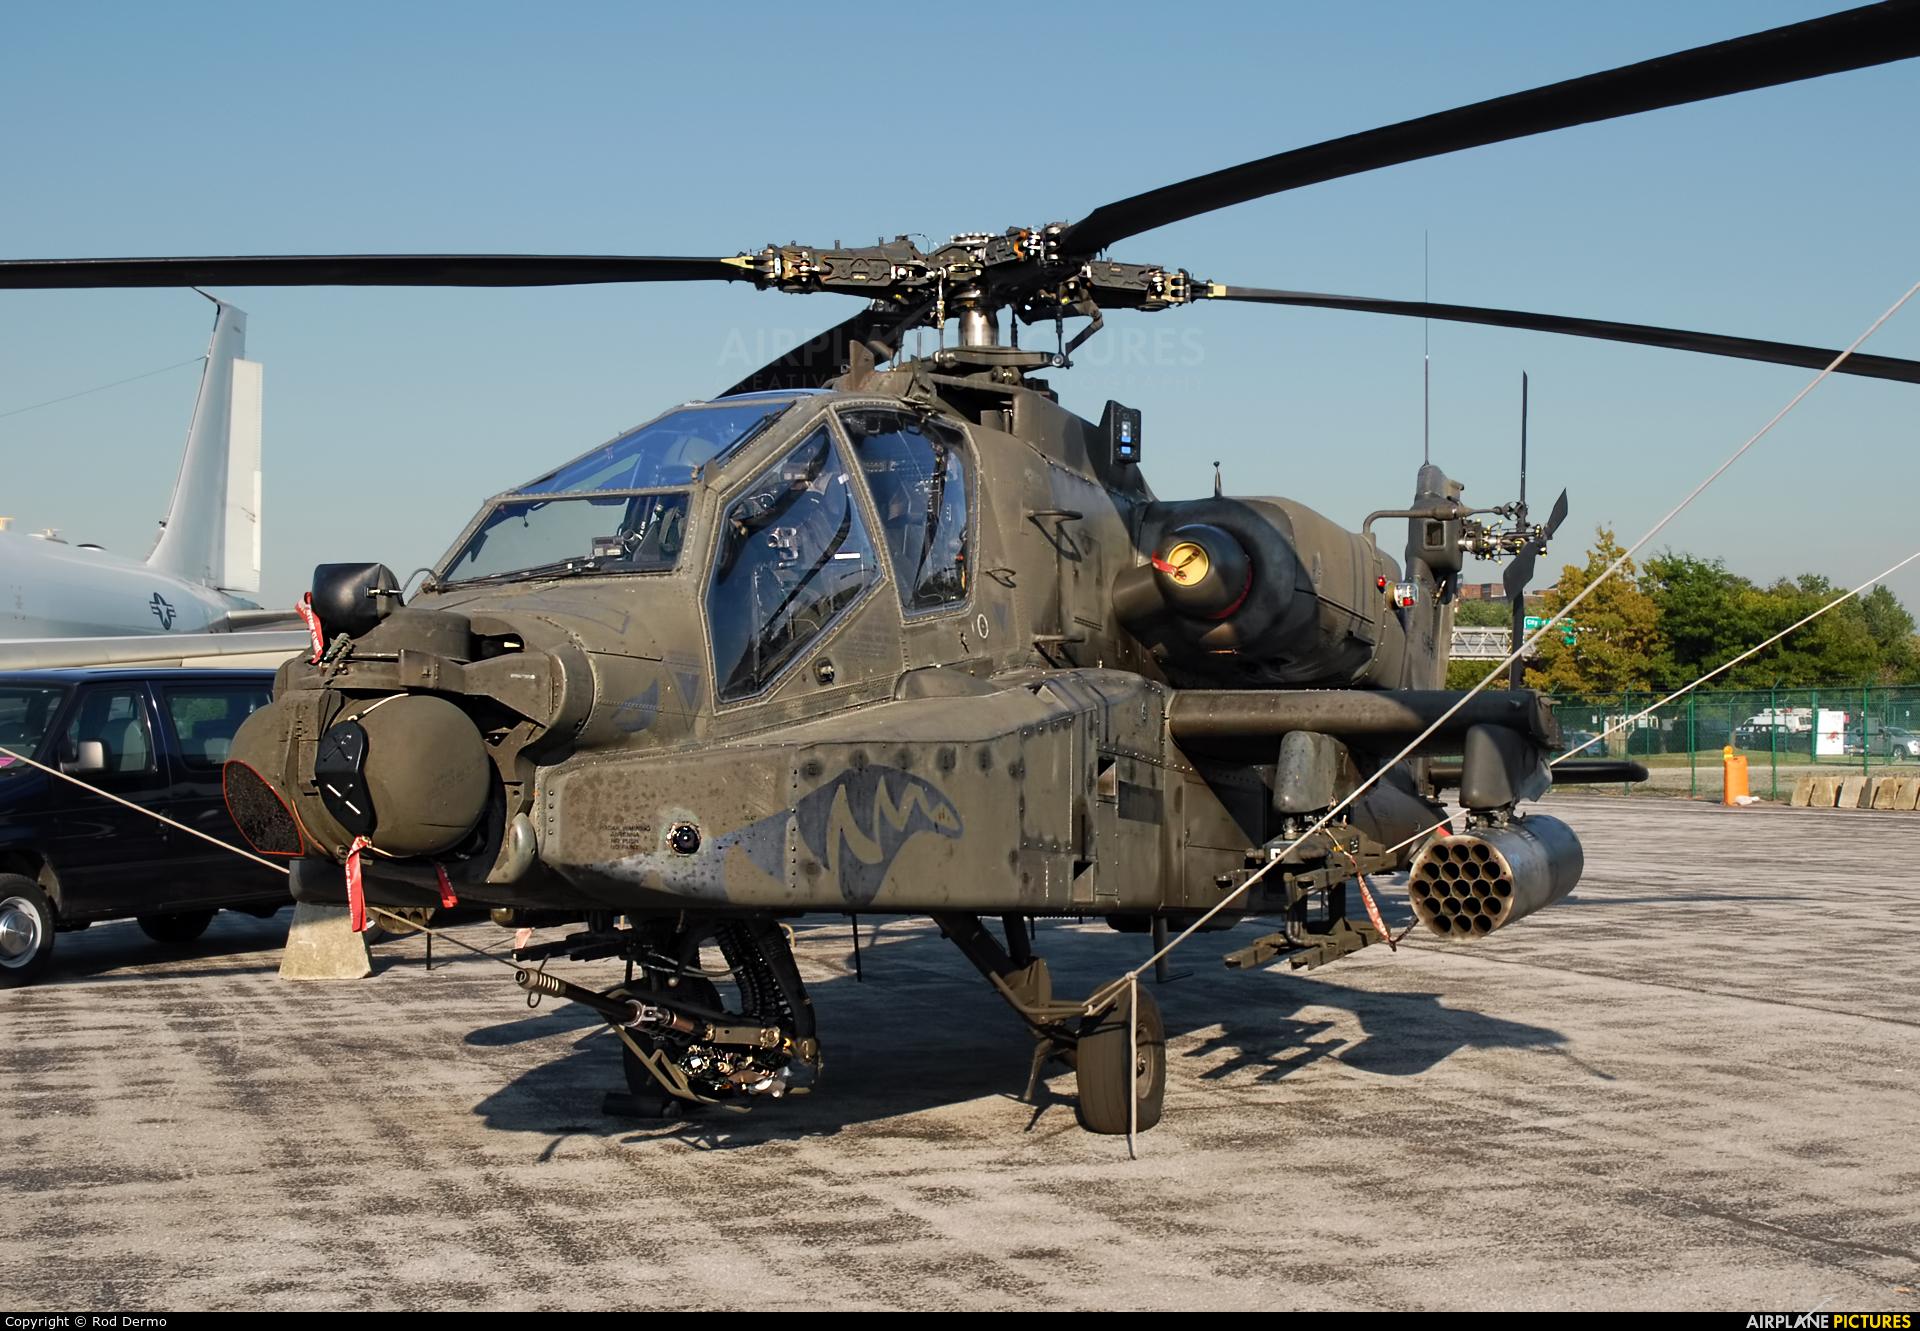 USA - Army 99-05134 aircraft at Cleveland - Burke Lakefront